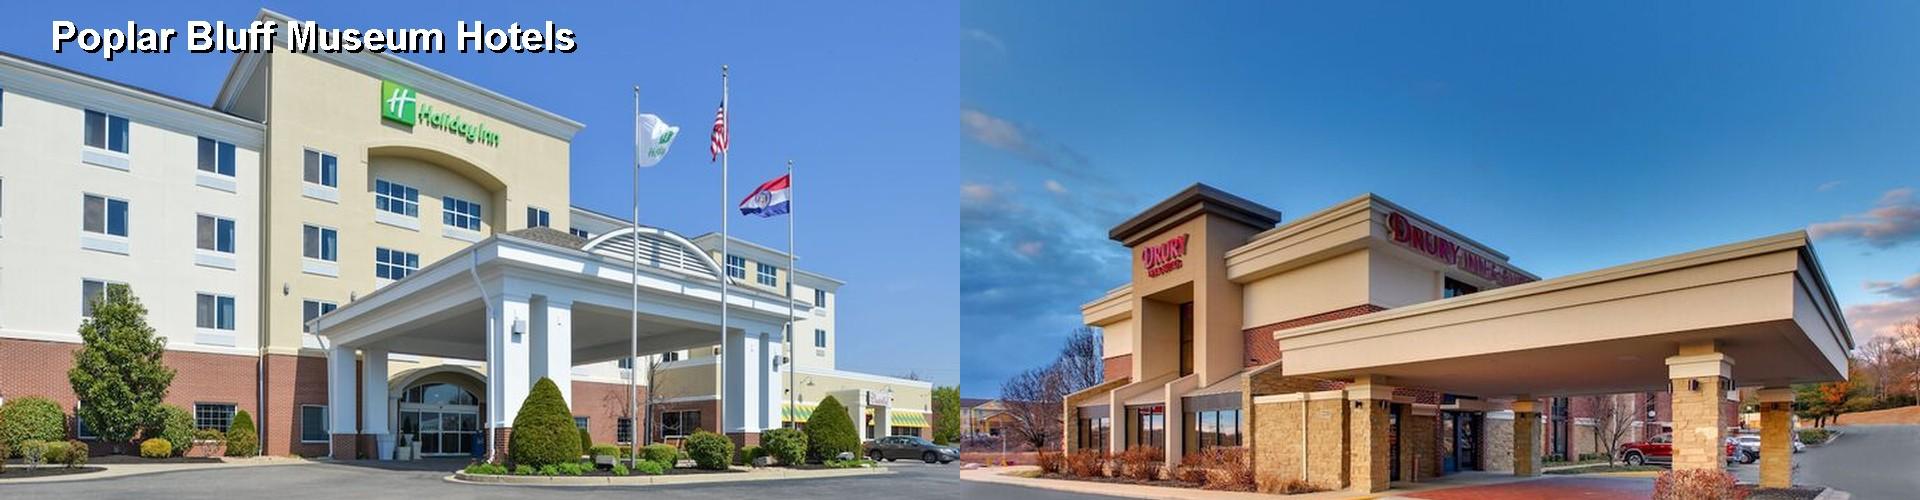 Hotels Near Poplar Bluff Museum (MO)